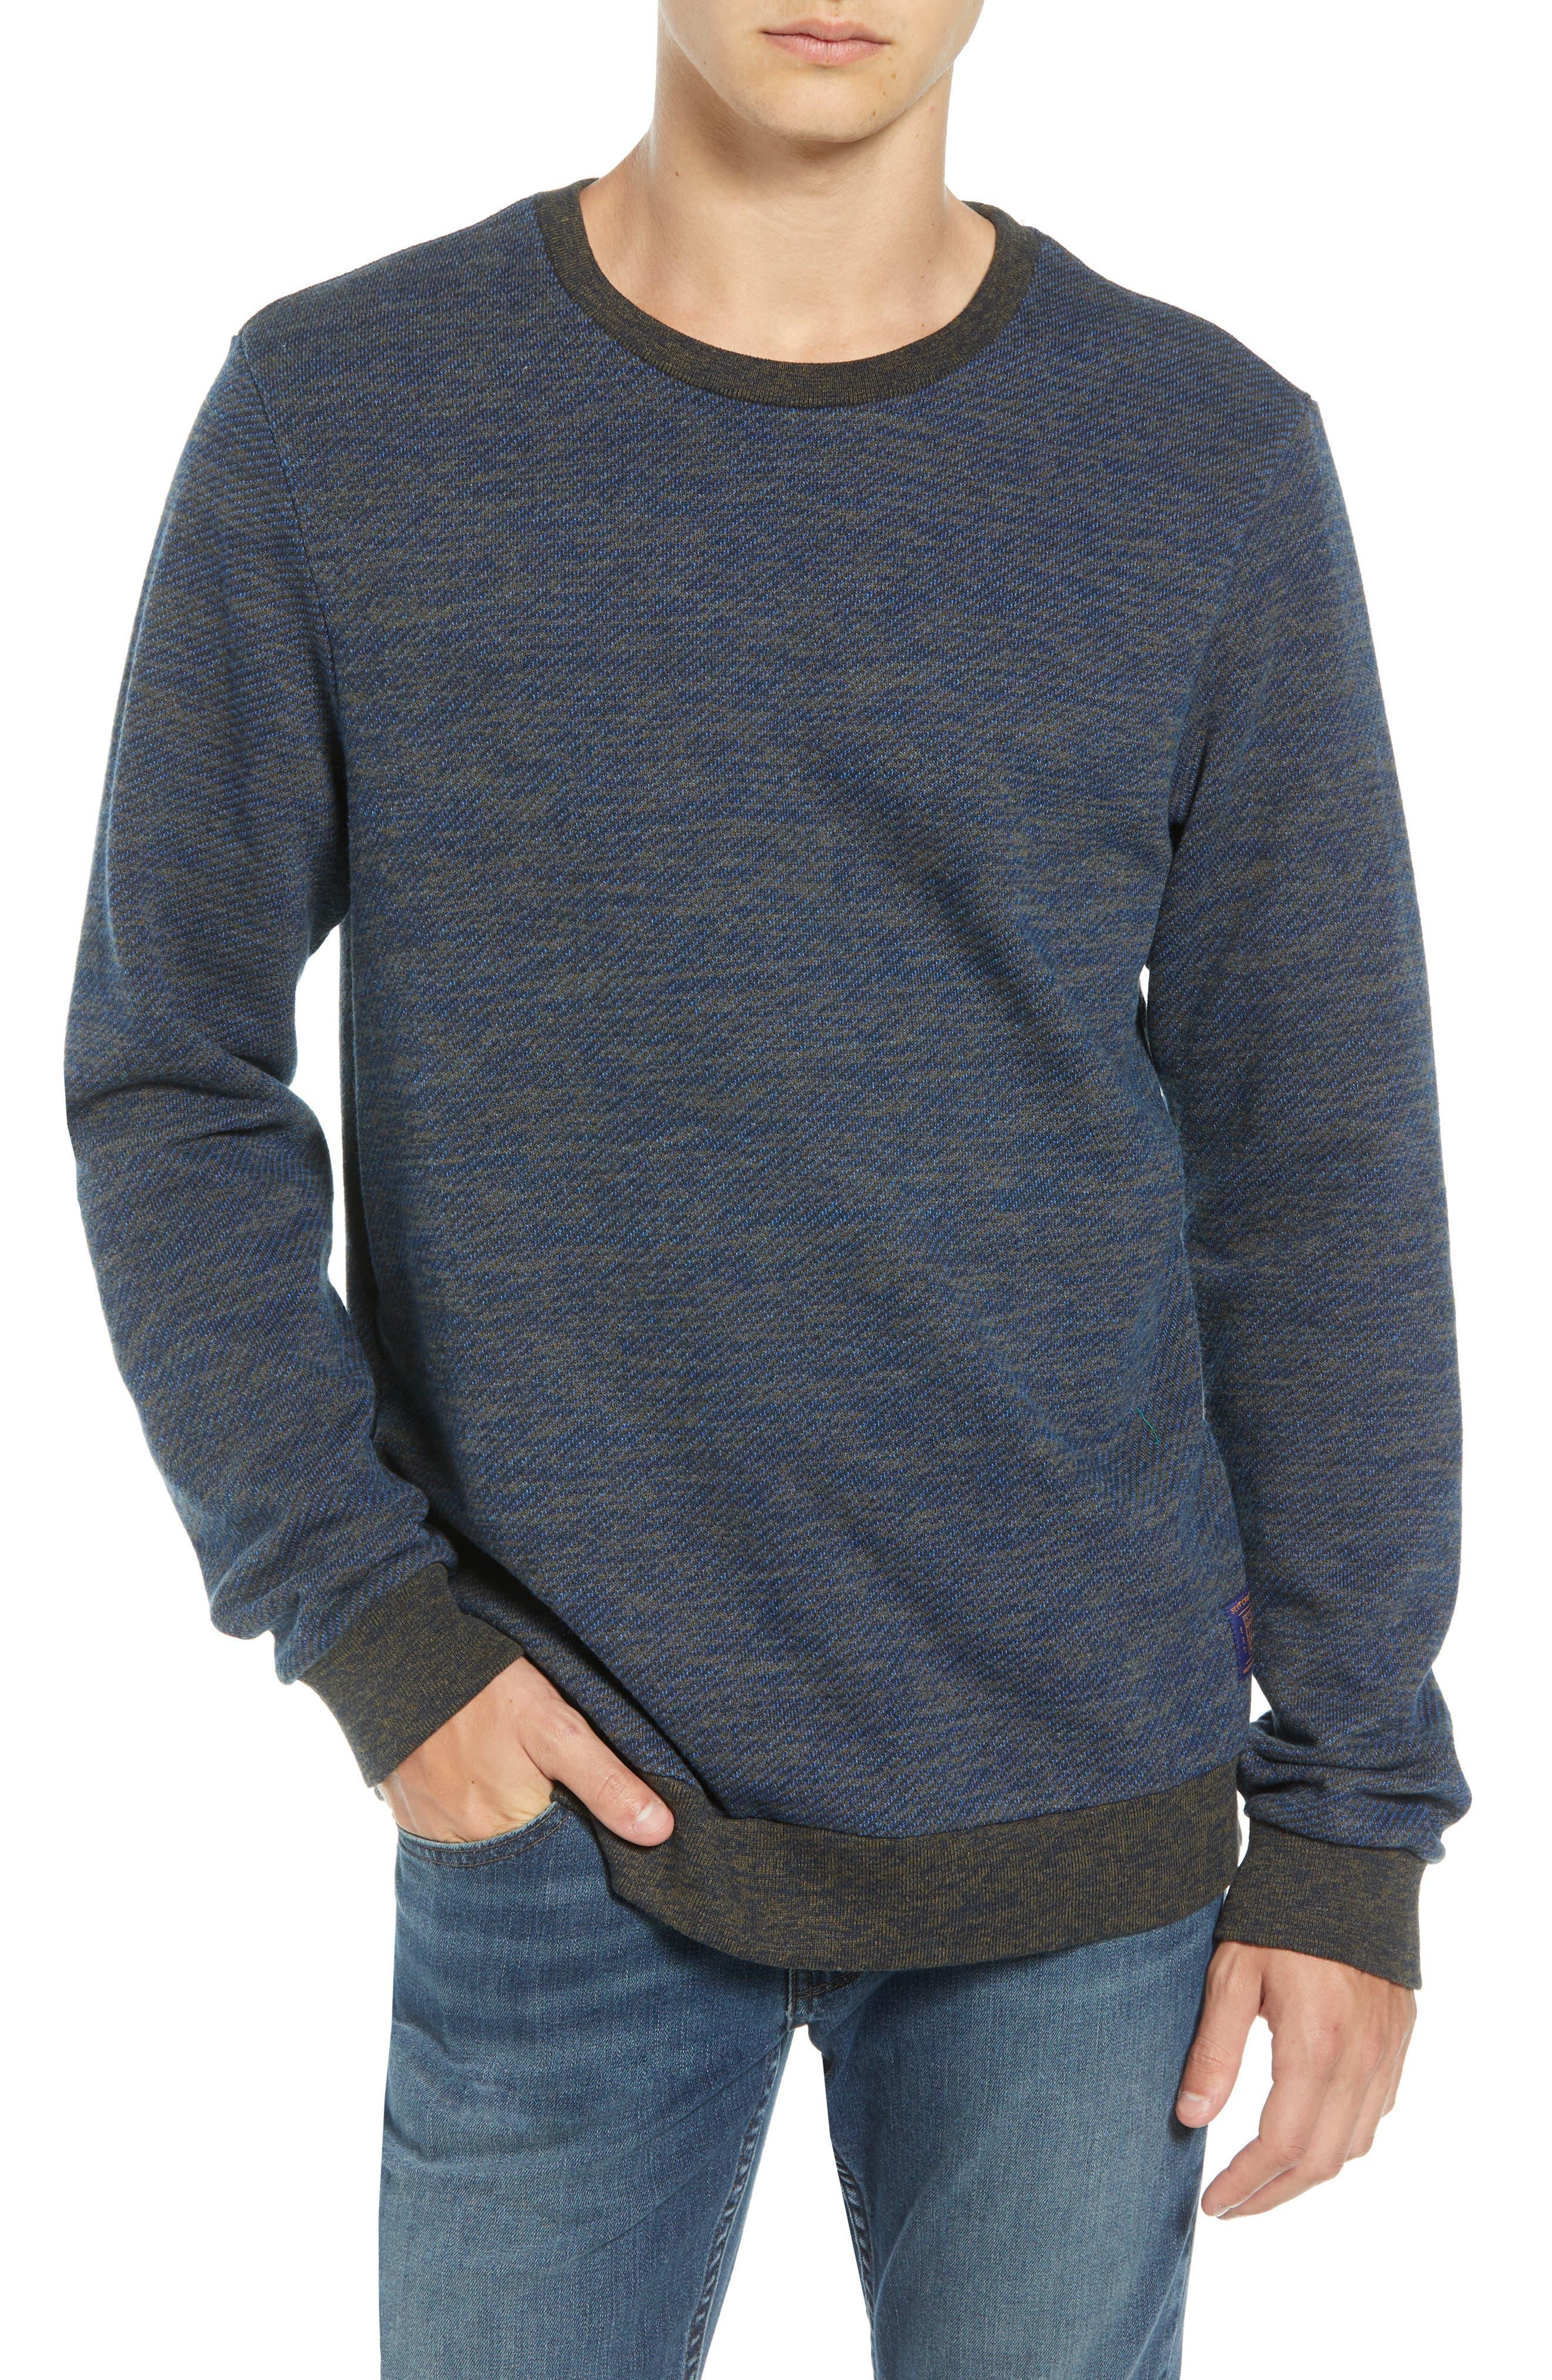 SCOTCH & SODA,                             Crewneck Sweatshirt,                             Main thumbnail 1, color,                             410